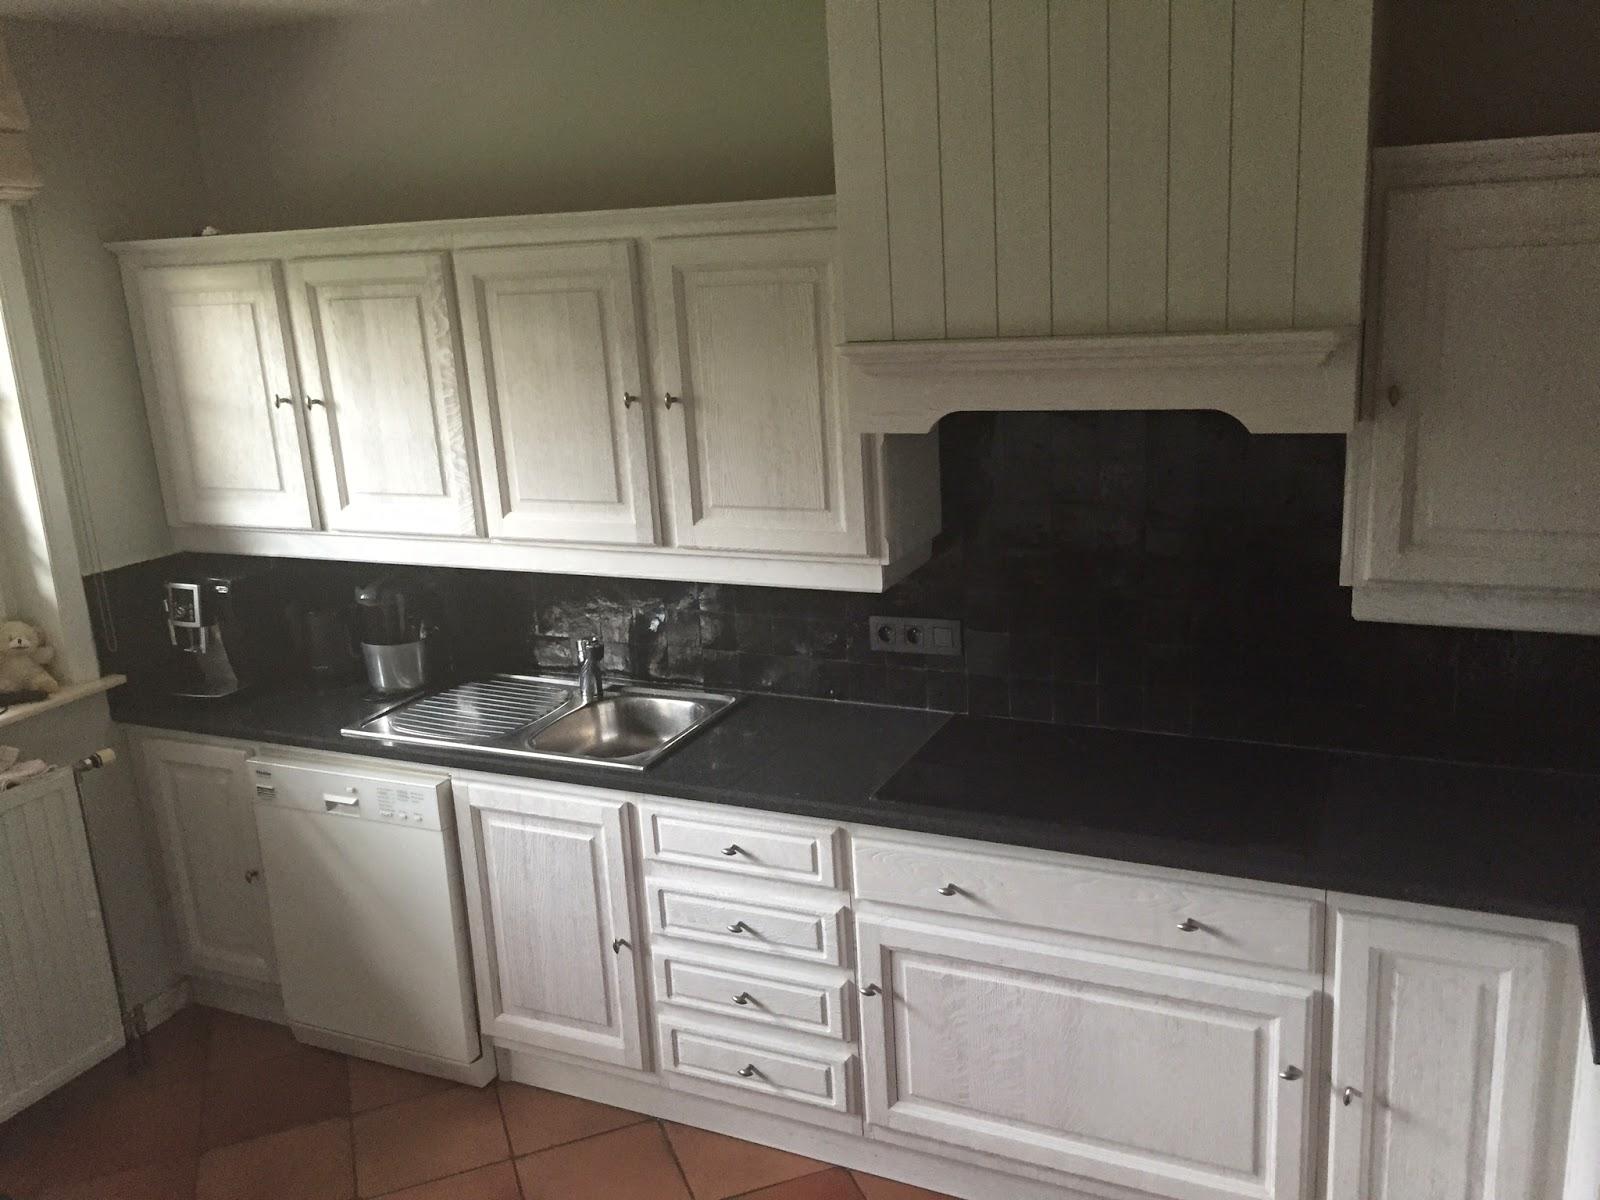 Keuken Renoveren Friesland : Eiken keuken opknappen